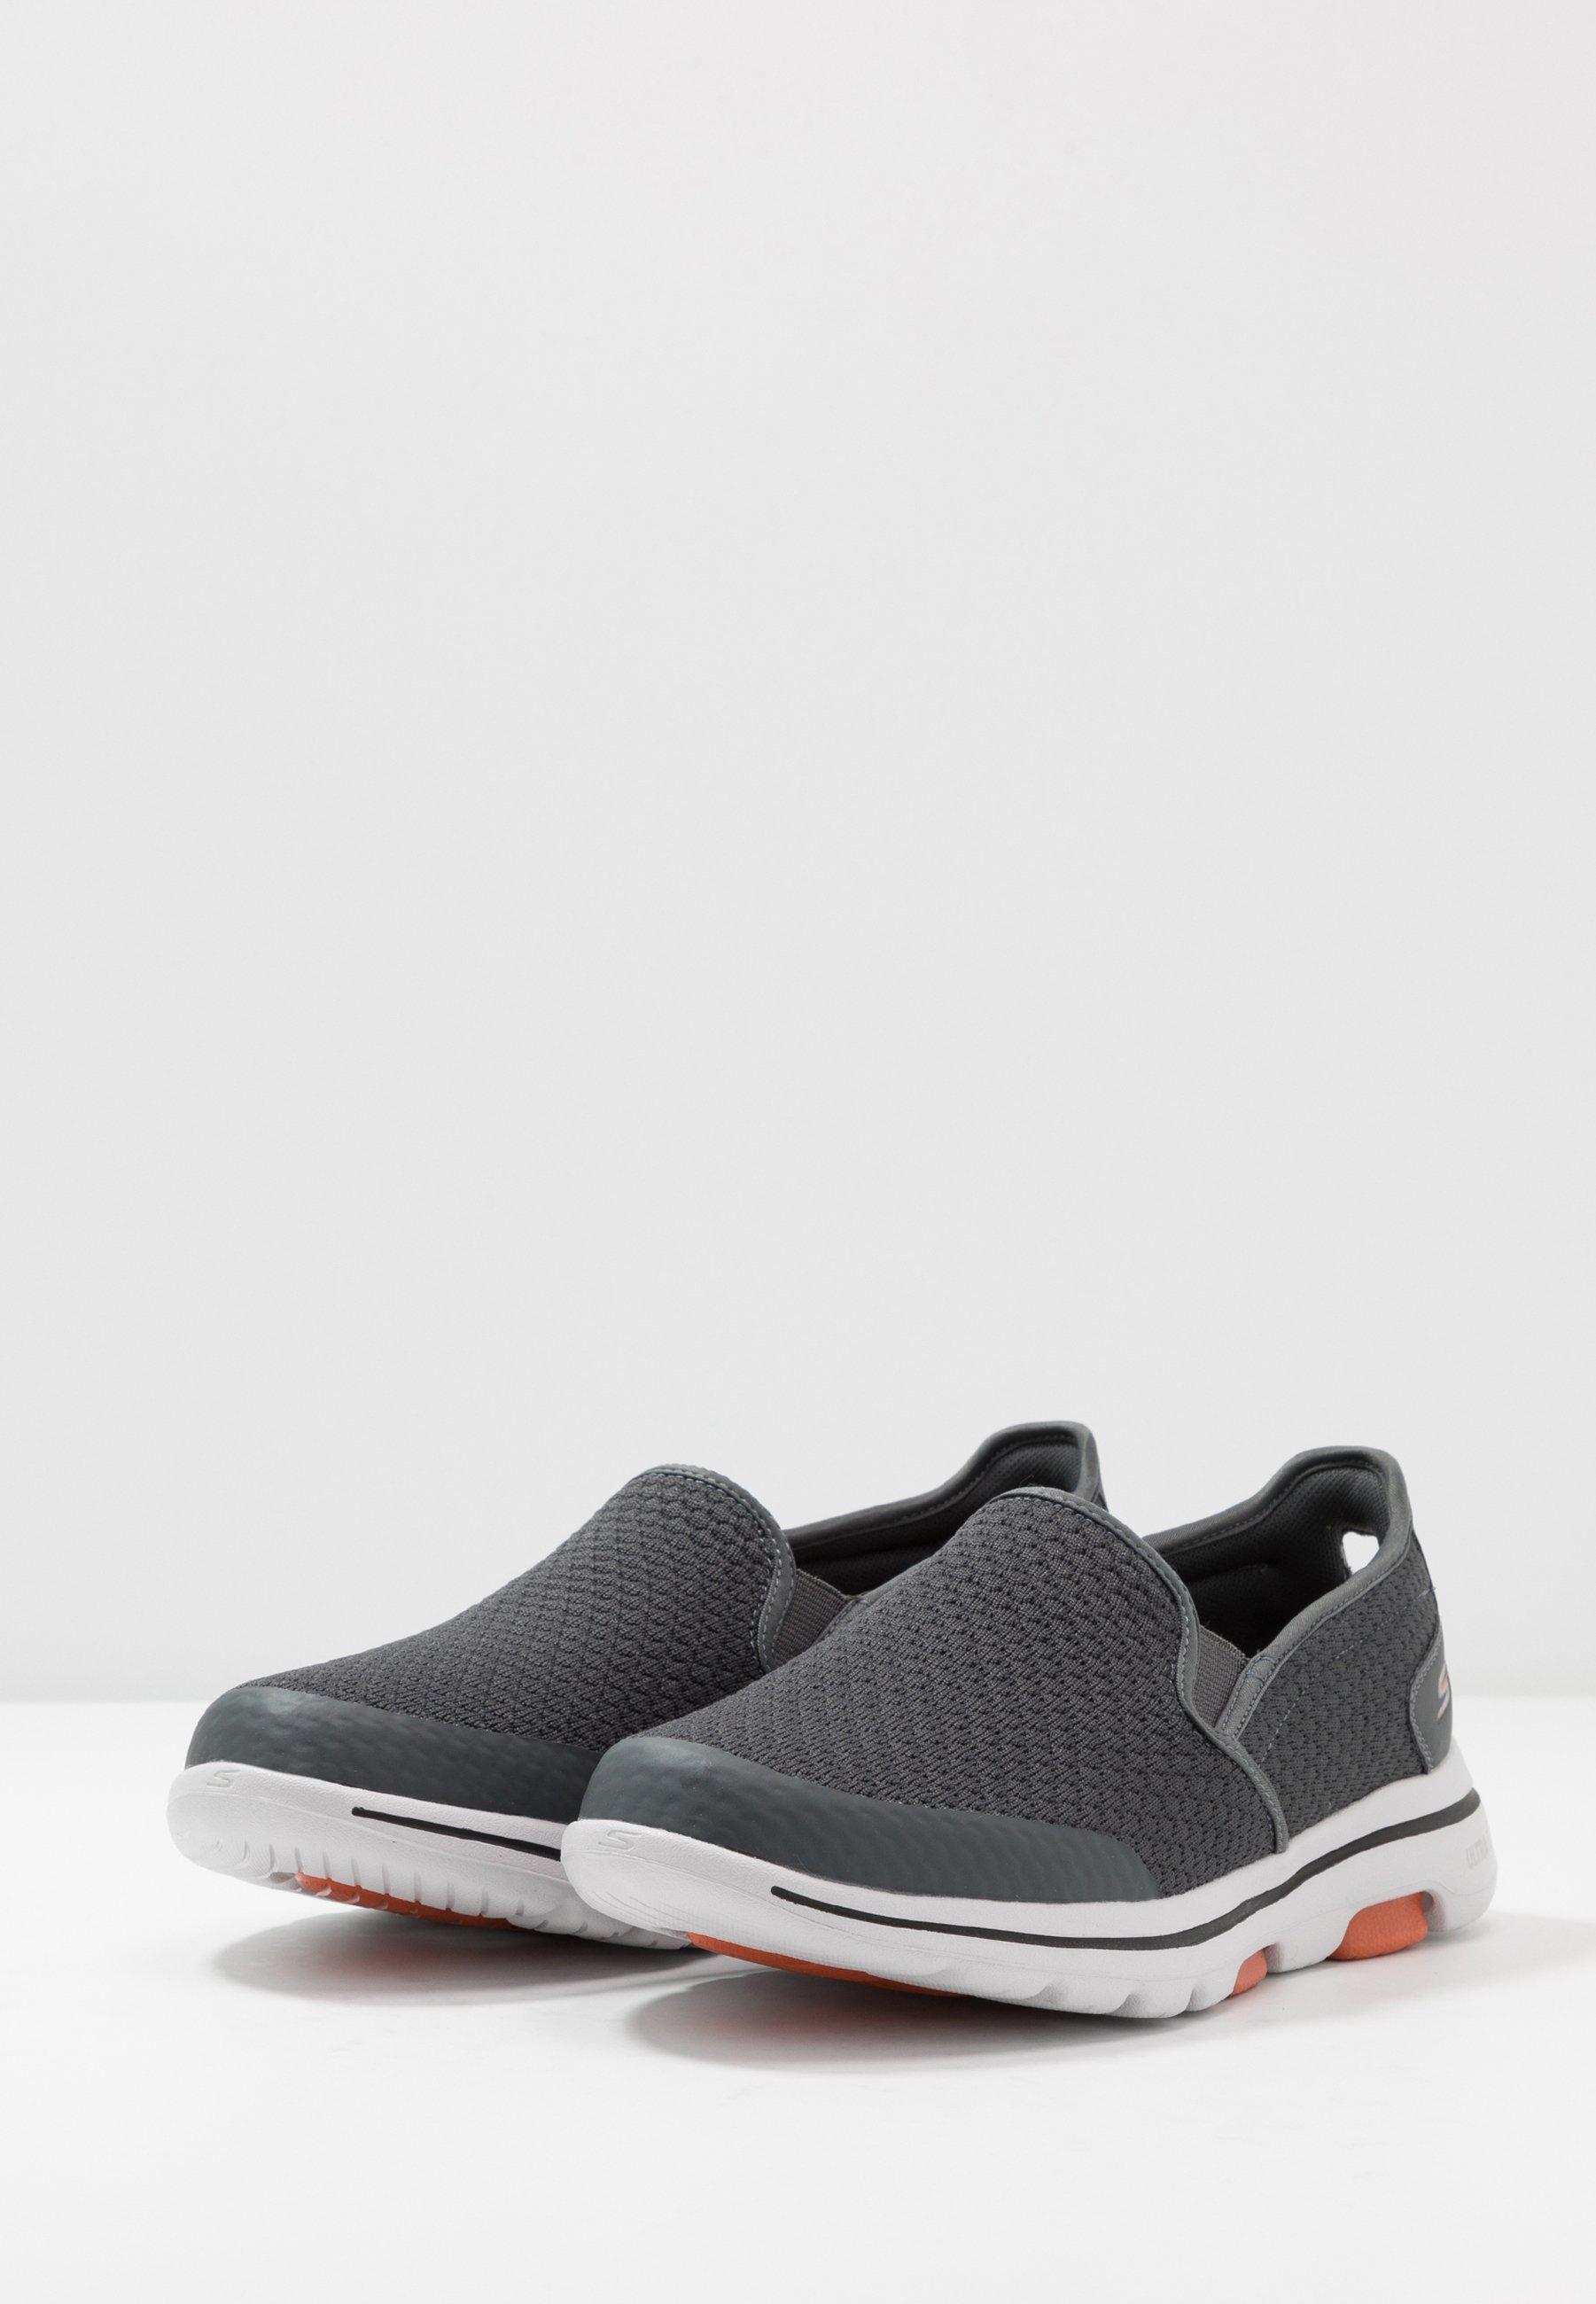 Skechers Performance Go Walk 5 Apprize - Chaussures De Course Charcoal